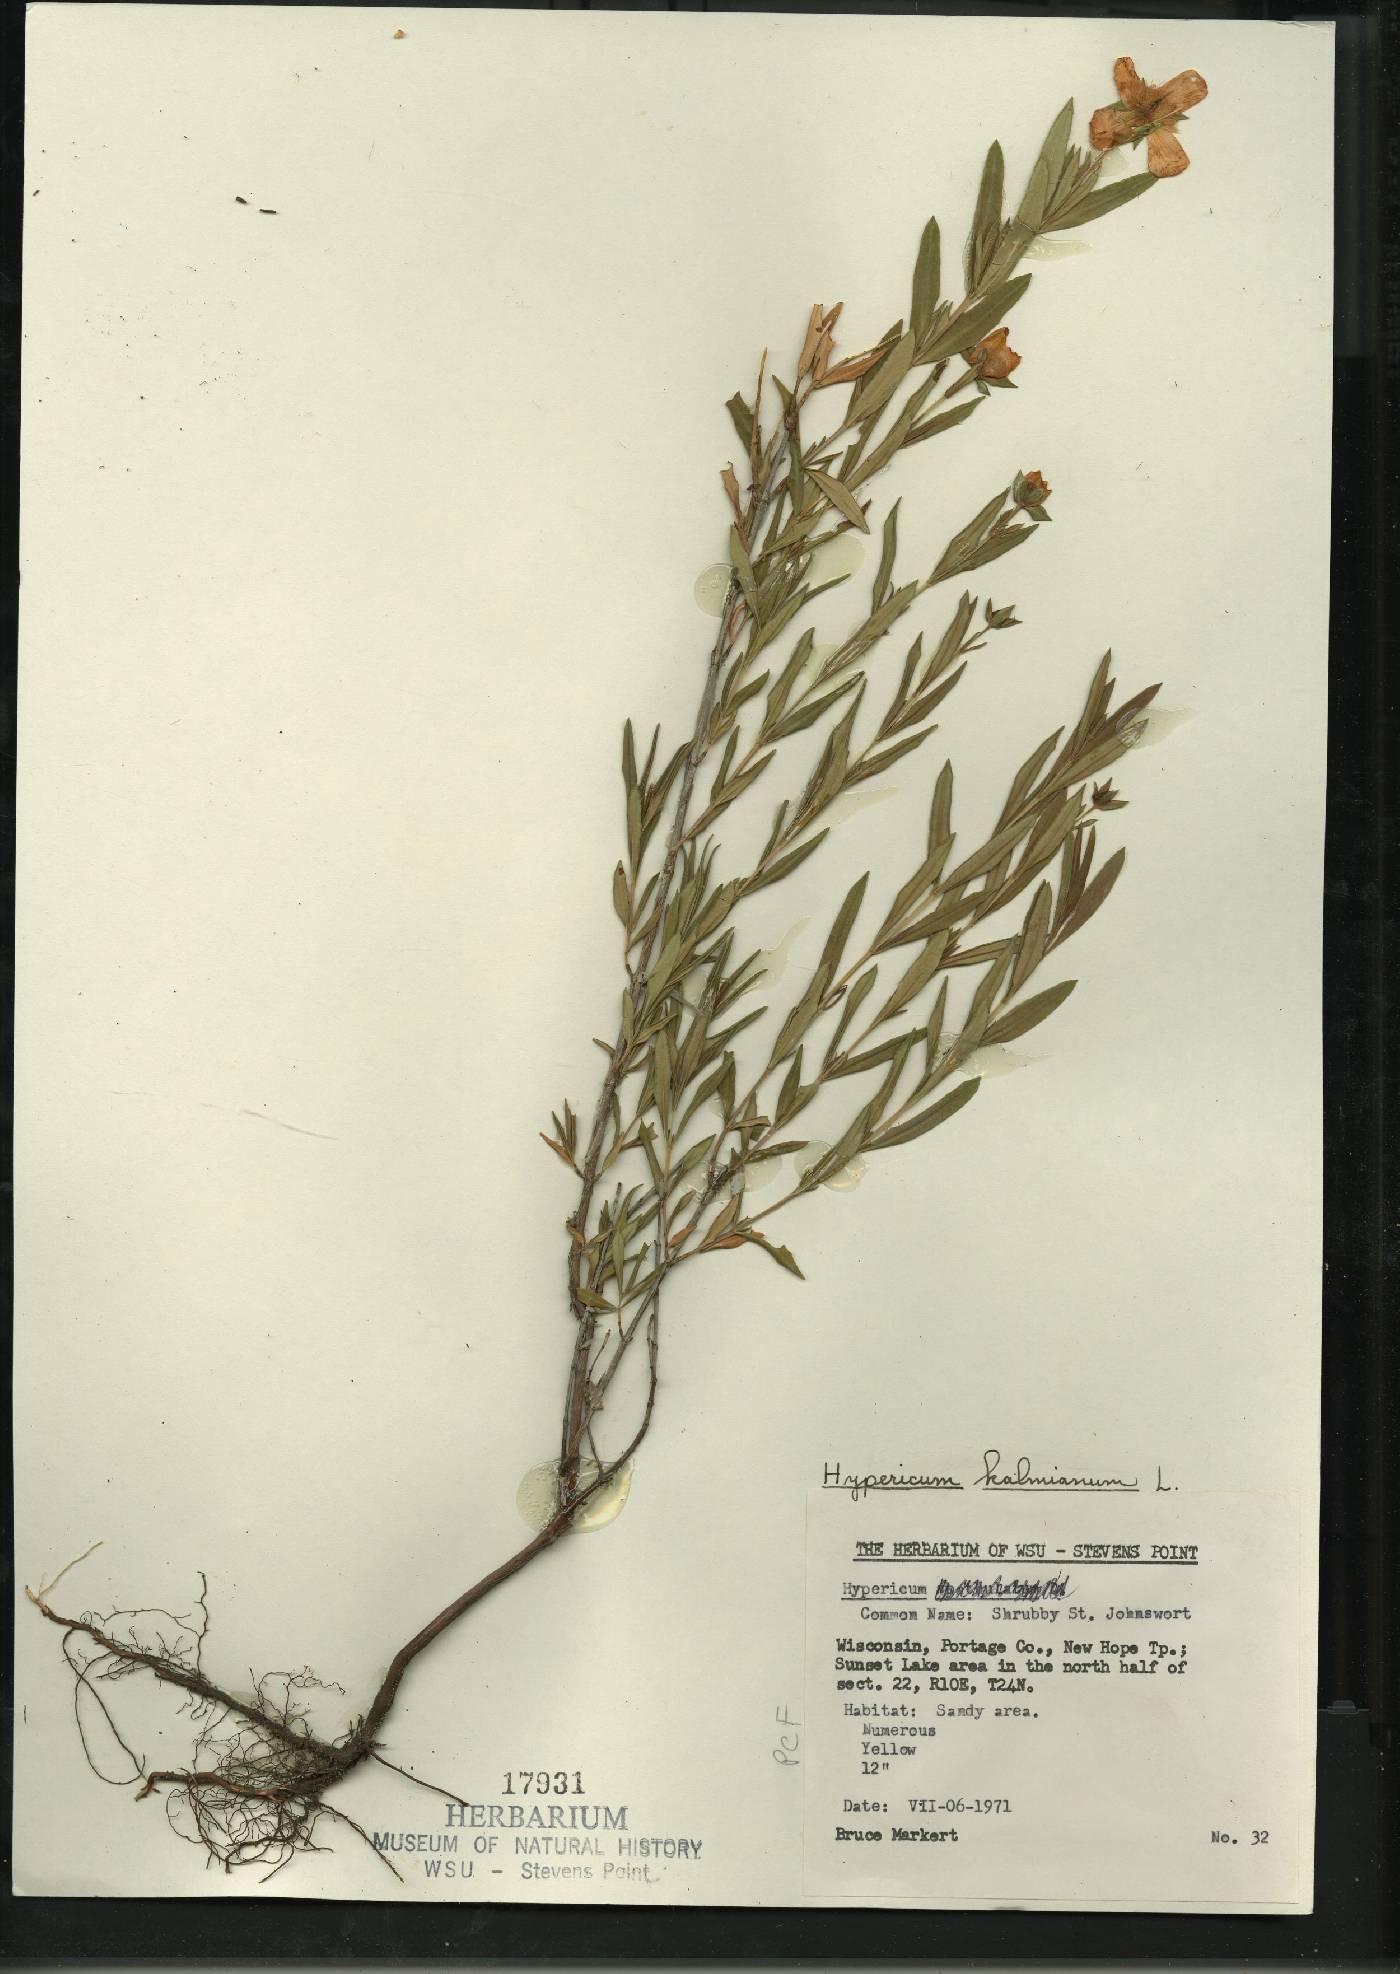 Hypericum kalmianum image